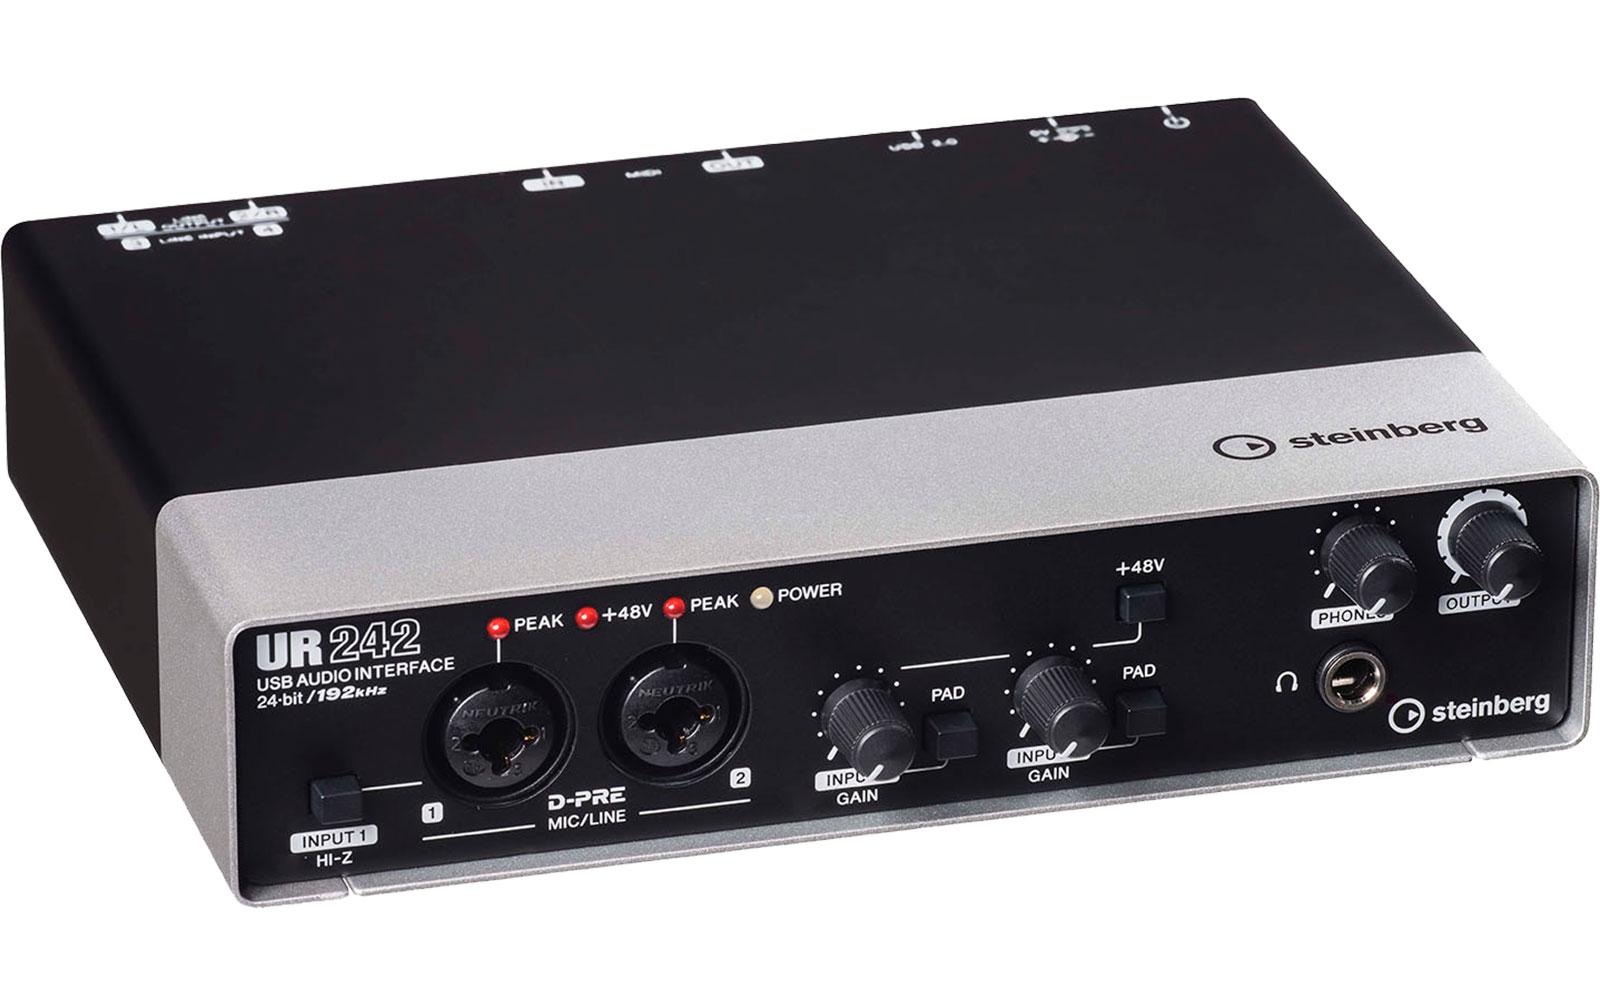 steinberg-ur242-usb-audio-interface-incl-midi-i-o-ipad